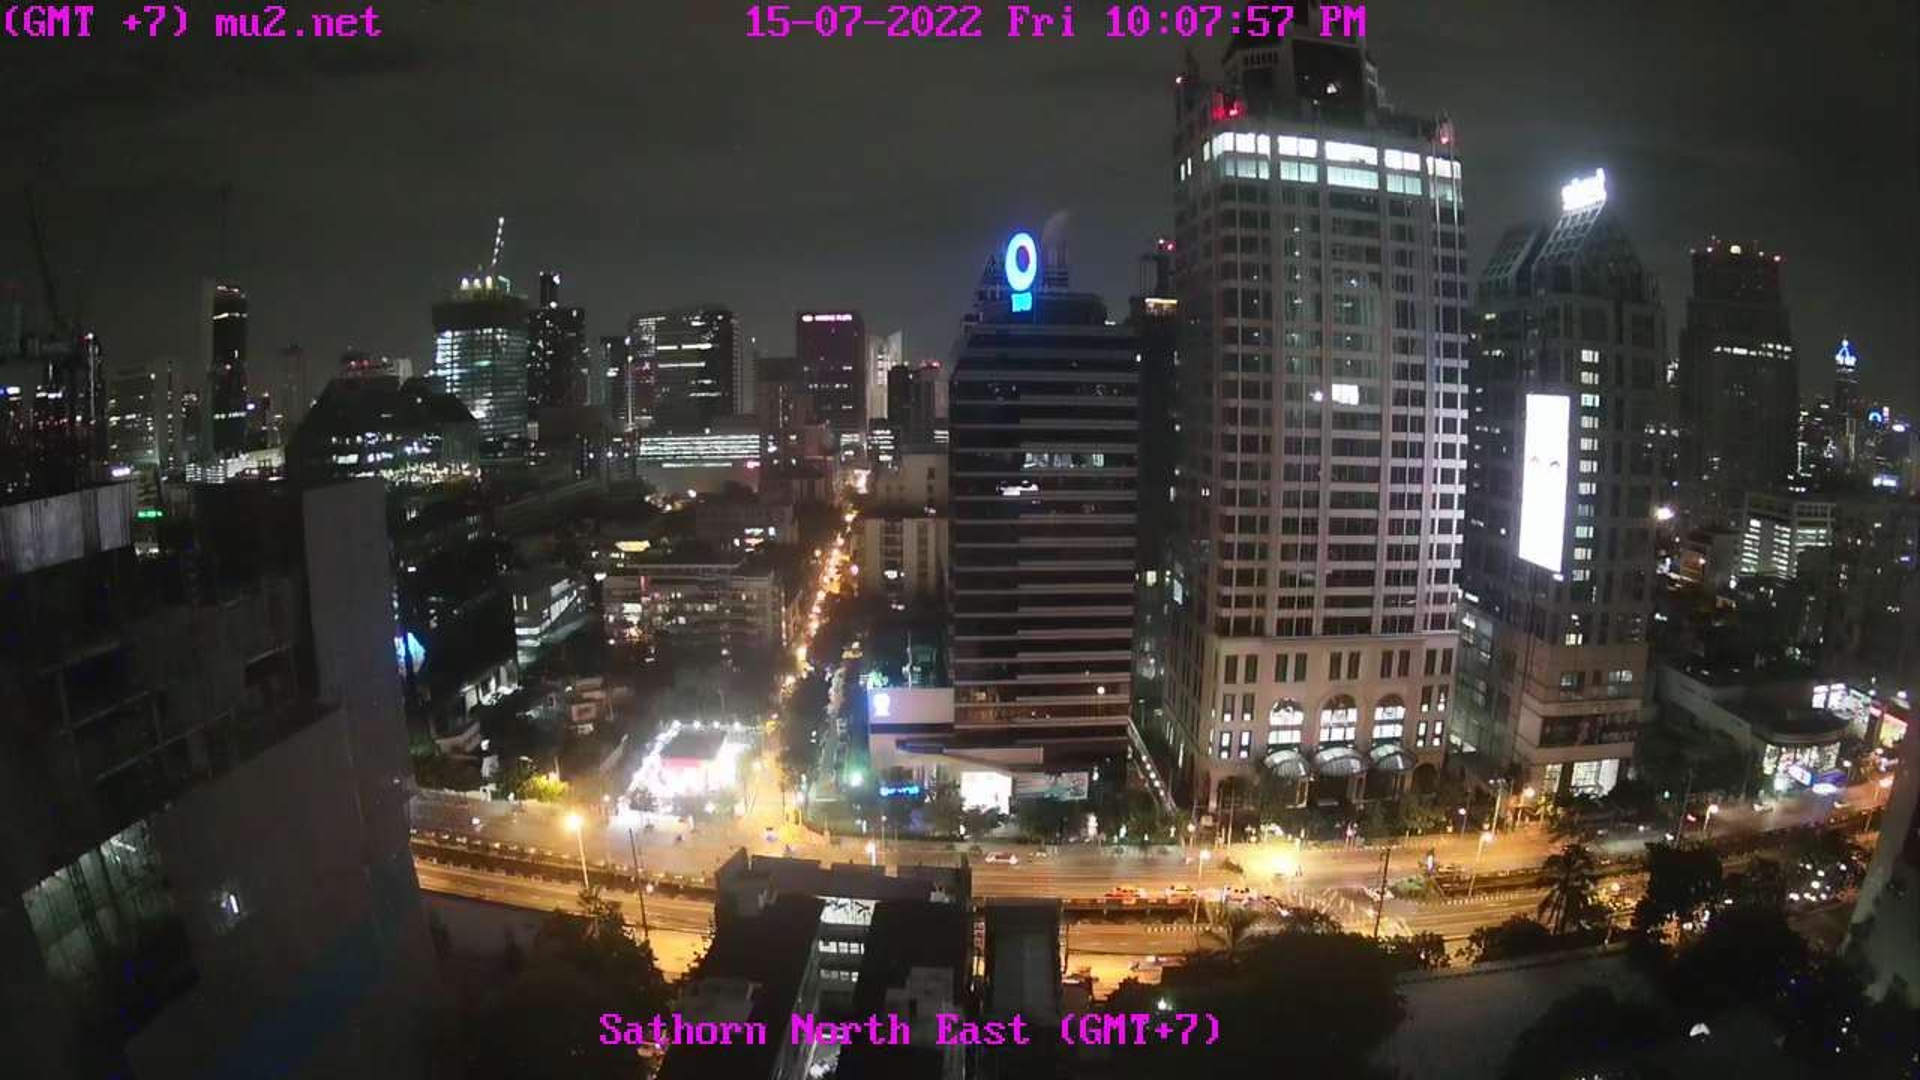 Bangkok Mon. 22:09